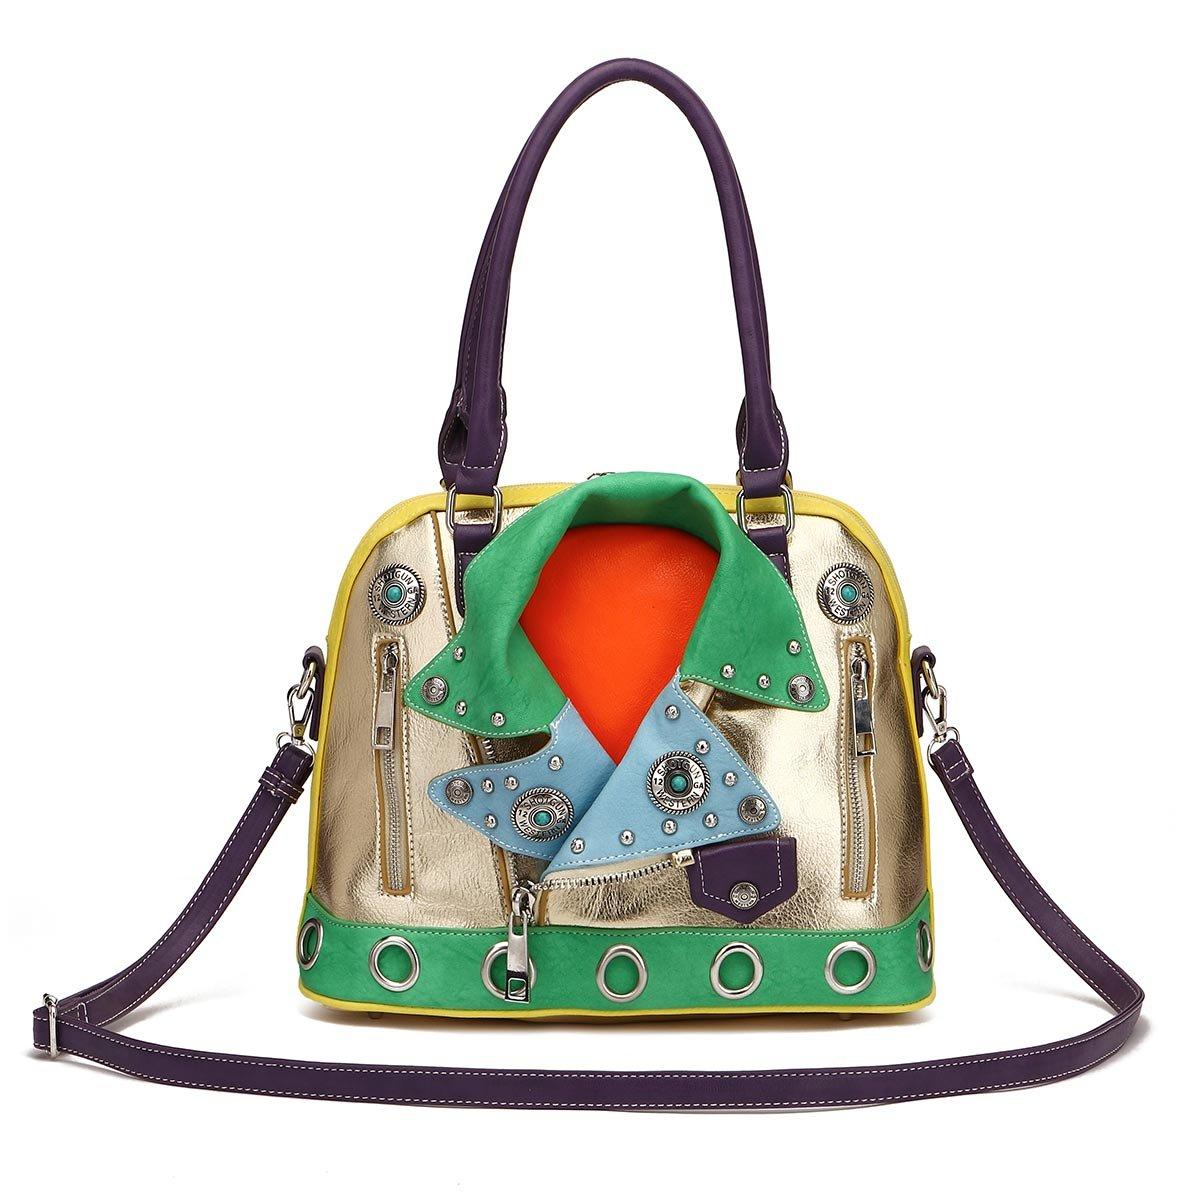 Cowgirl Trendy Motorcycle Biker Handbag Concealed Carry Purse Colorblock Jacket Shoulder Bag by Cowgirl Trendy